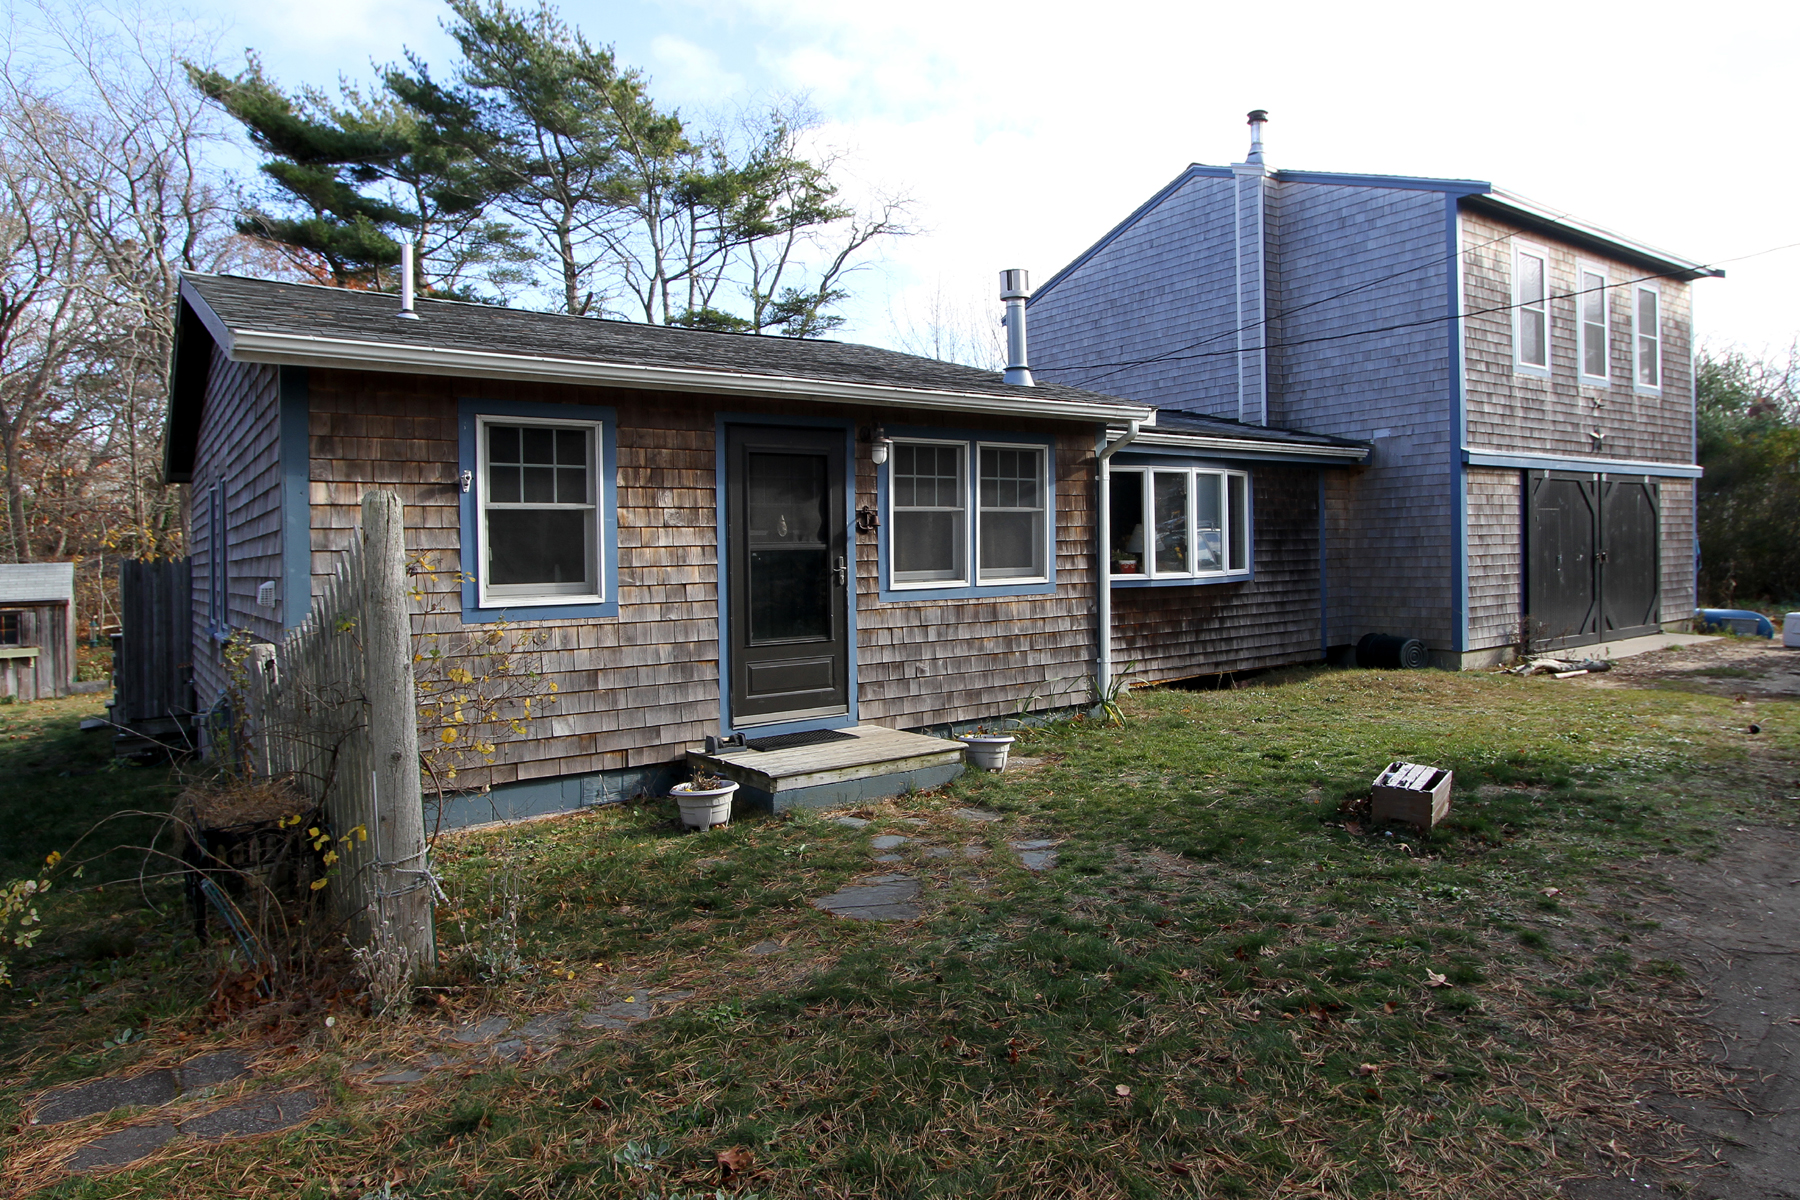 sales property at 440 Massasoit Road, Eastham, MA